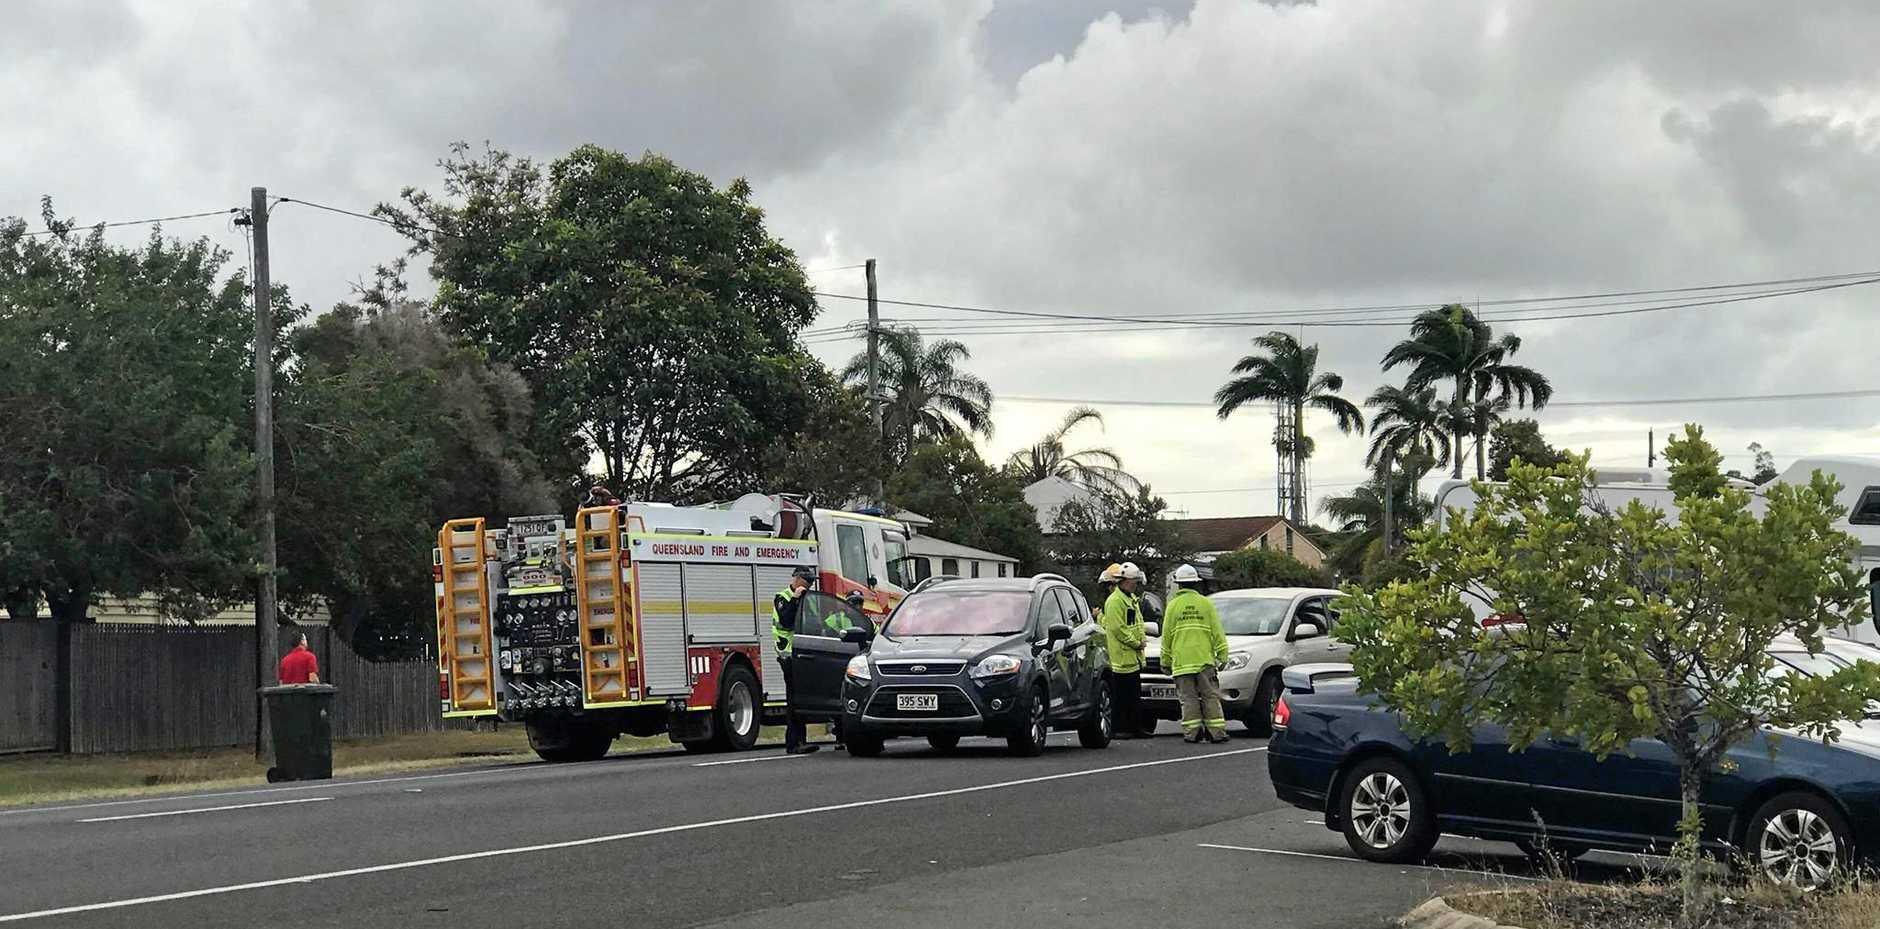 The scene of the crash on Branyan St.